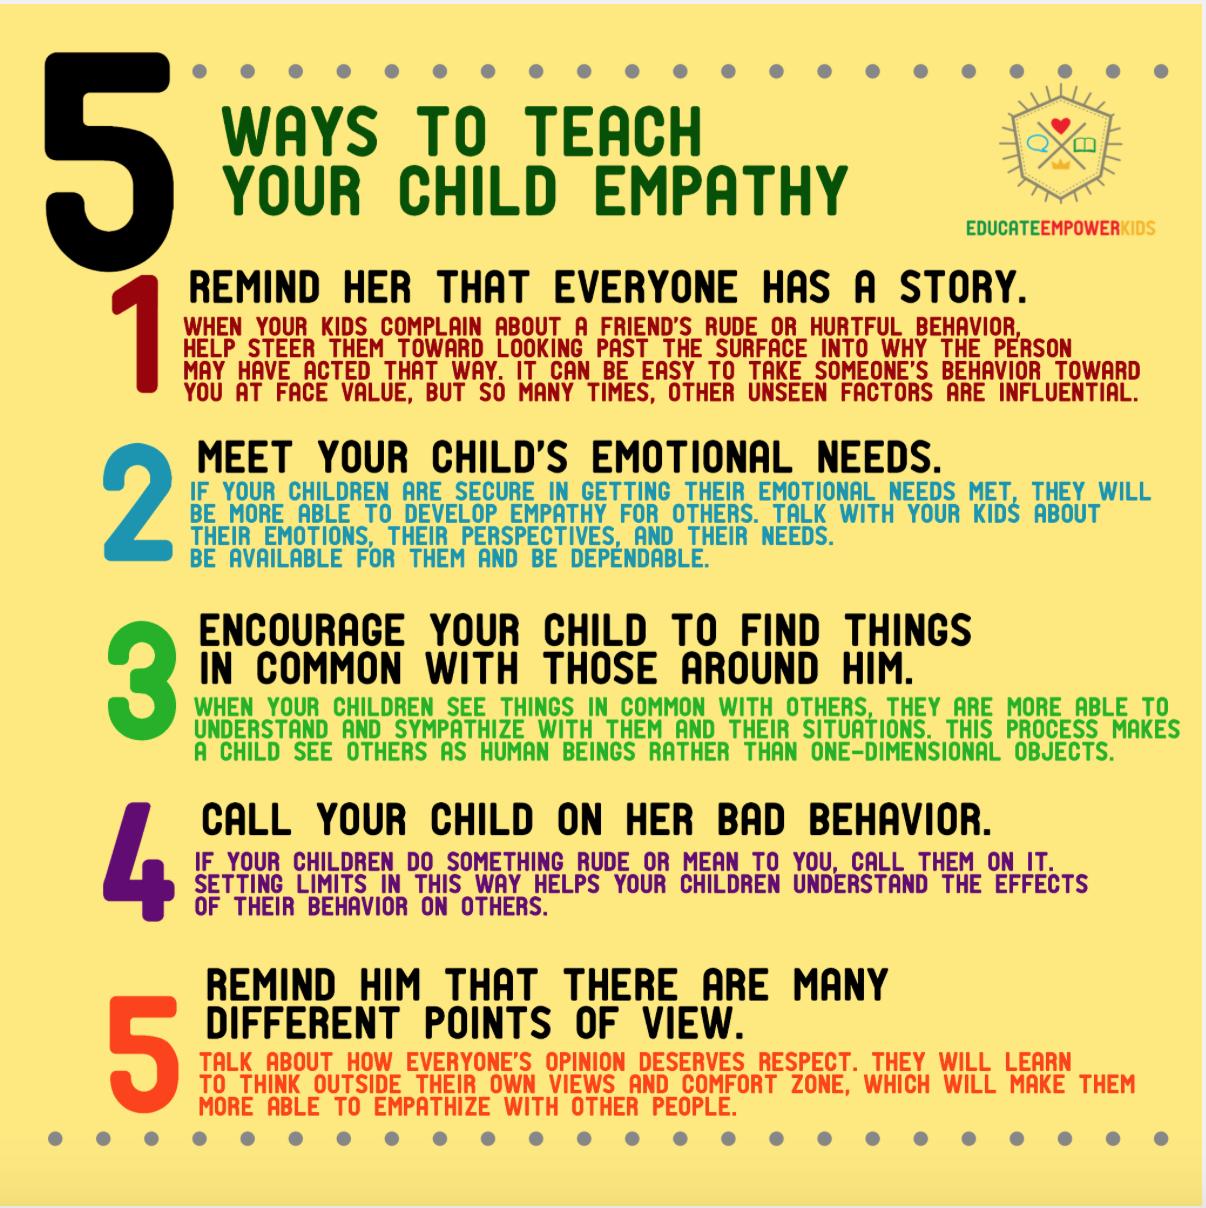 Five Ways to Teach Your Child Empathy